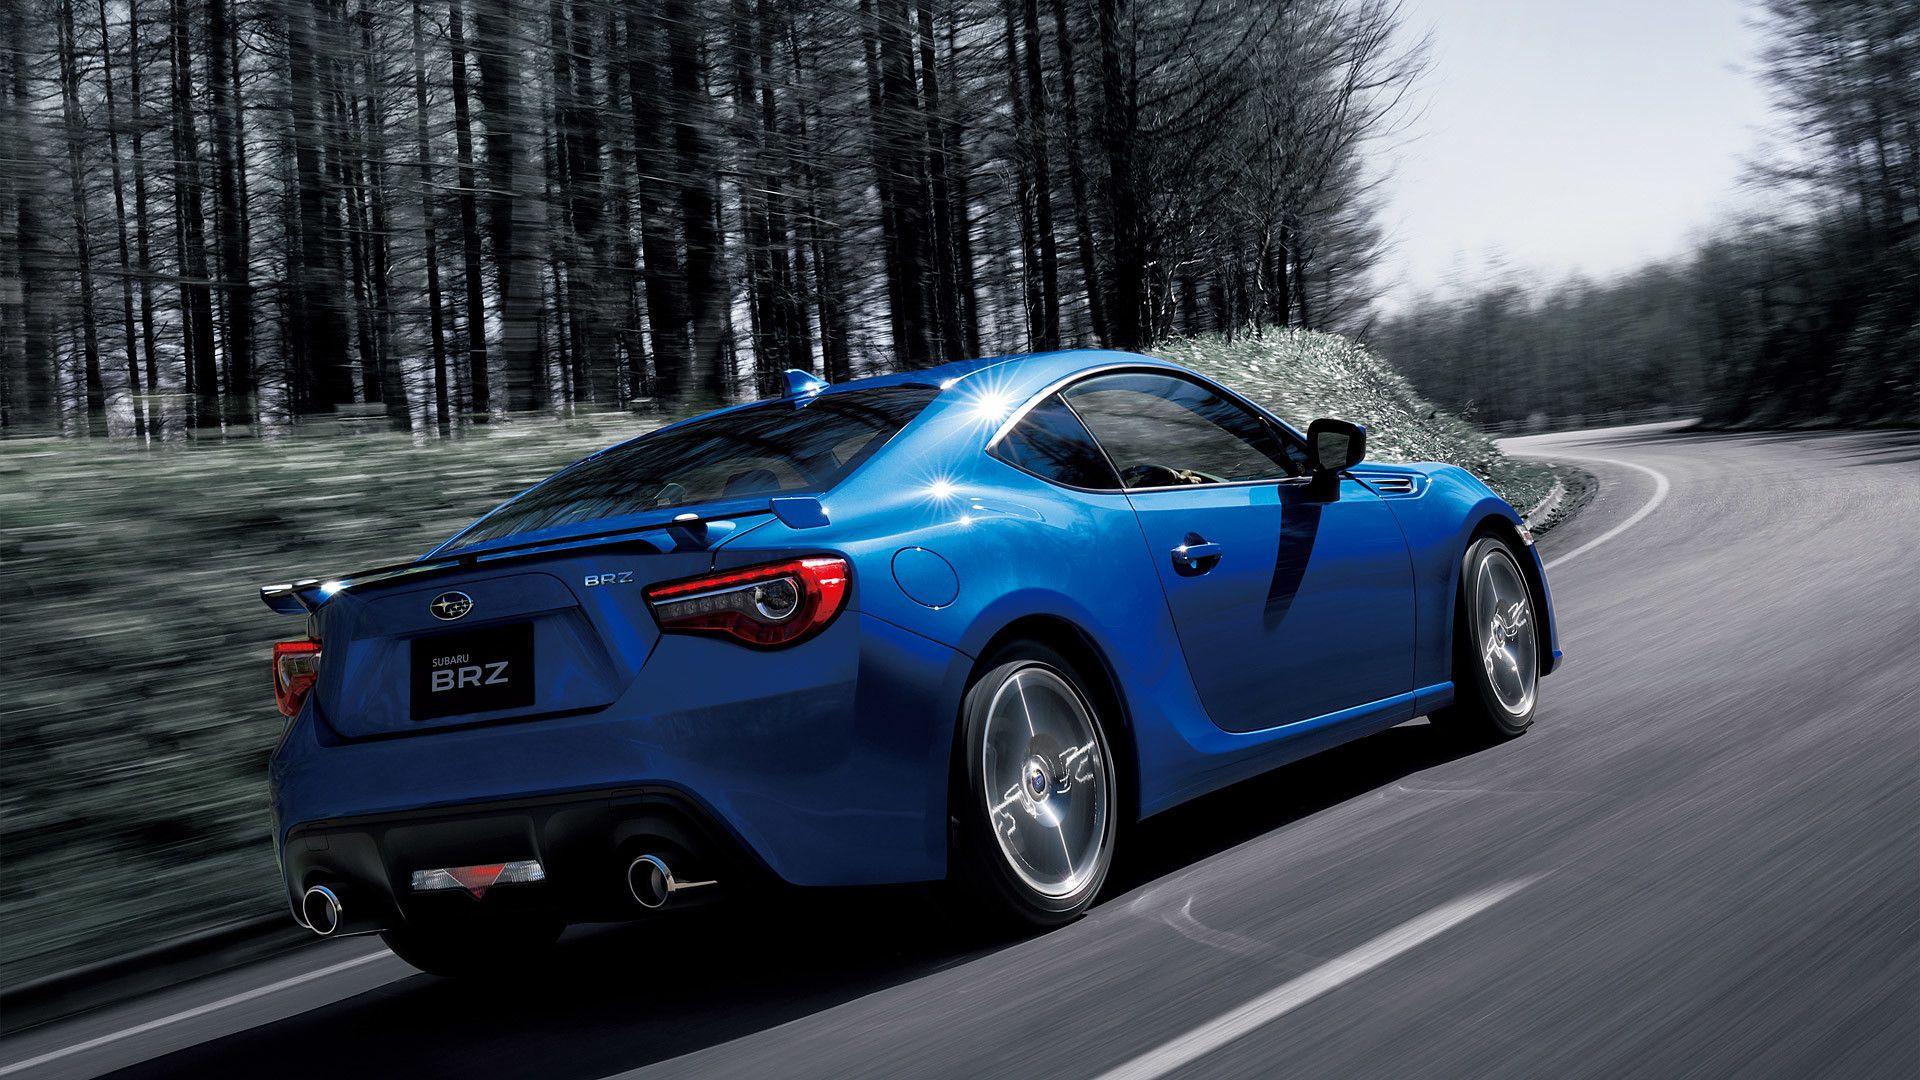 17 Subaru Brz Wallpaper High Definition スバル